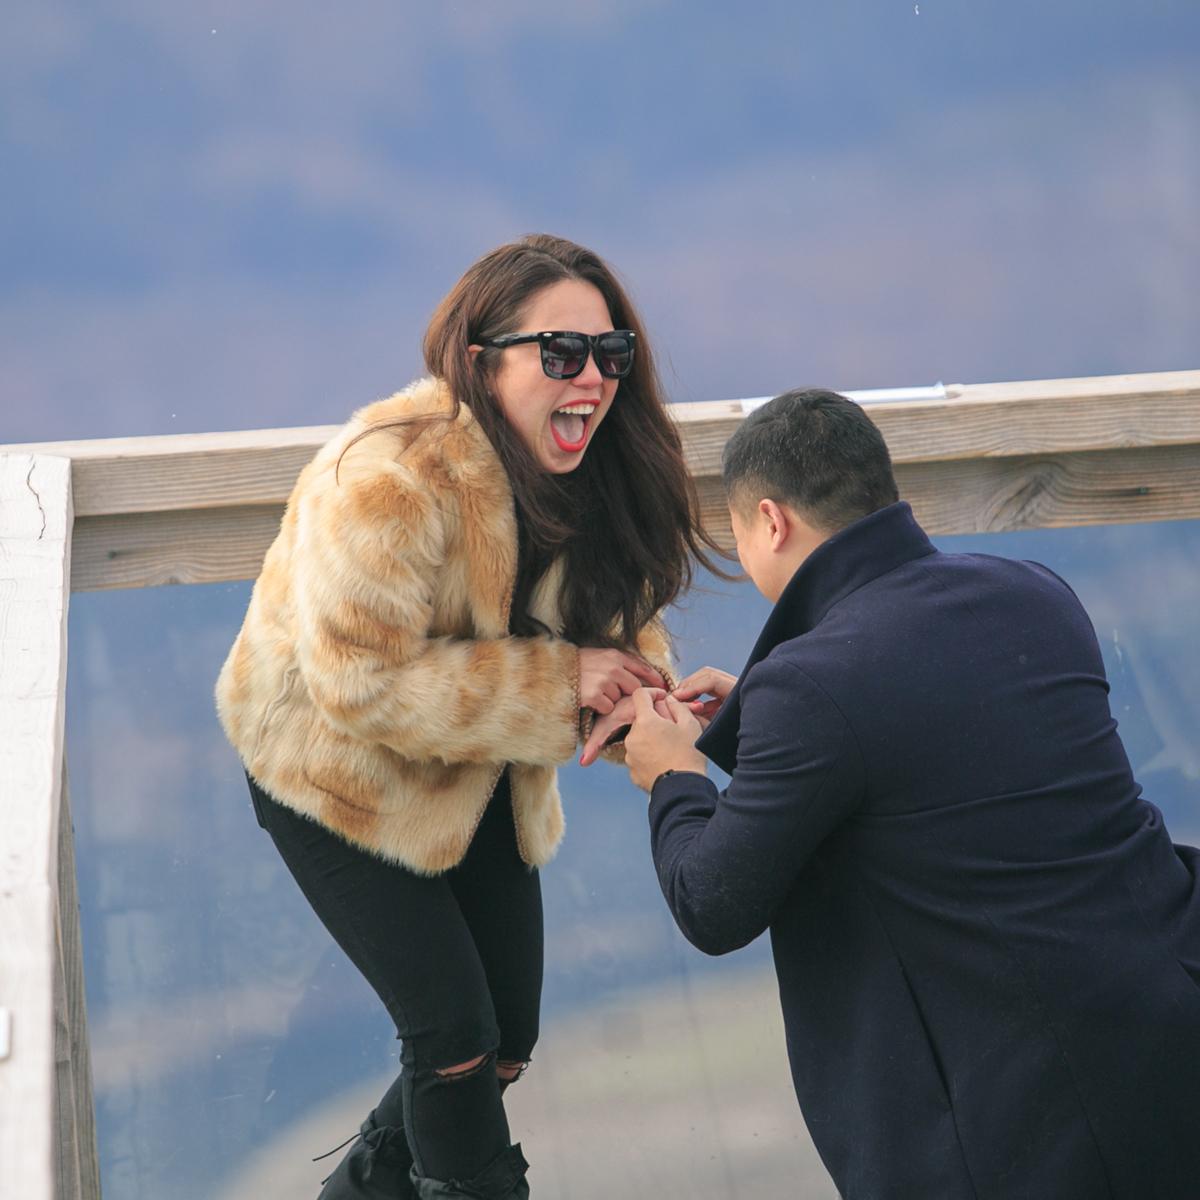 wedding-proposal-sea-to-sky-squamish-surprise-reaction.jpg